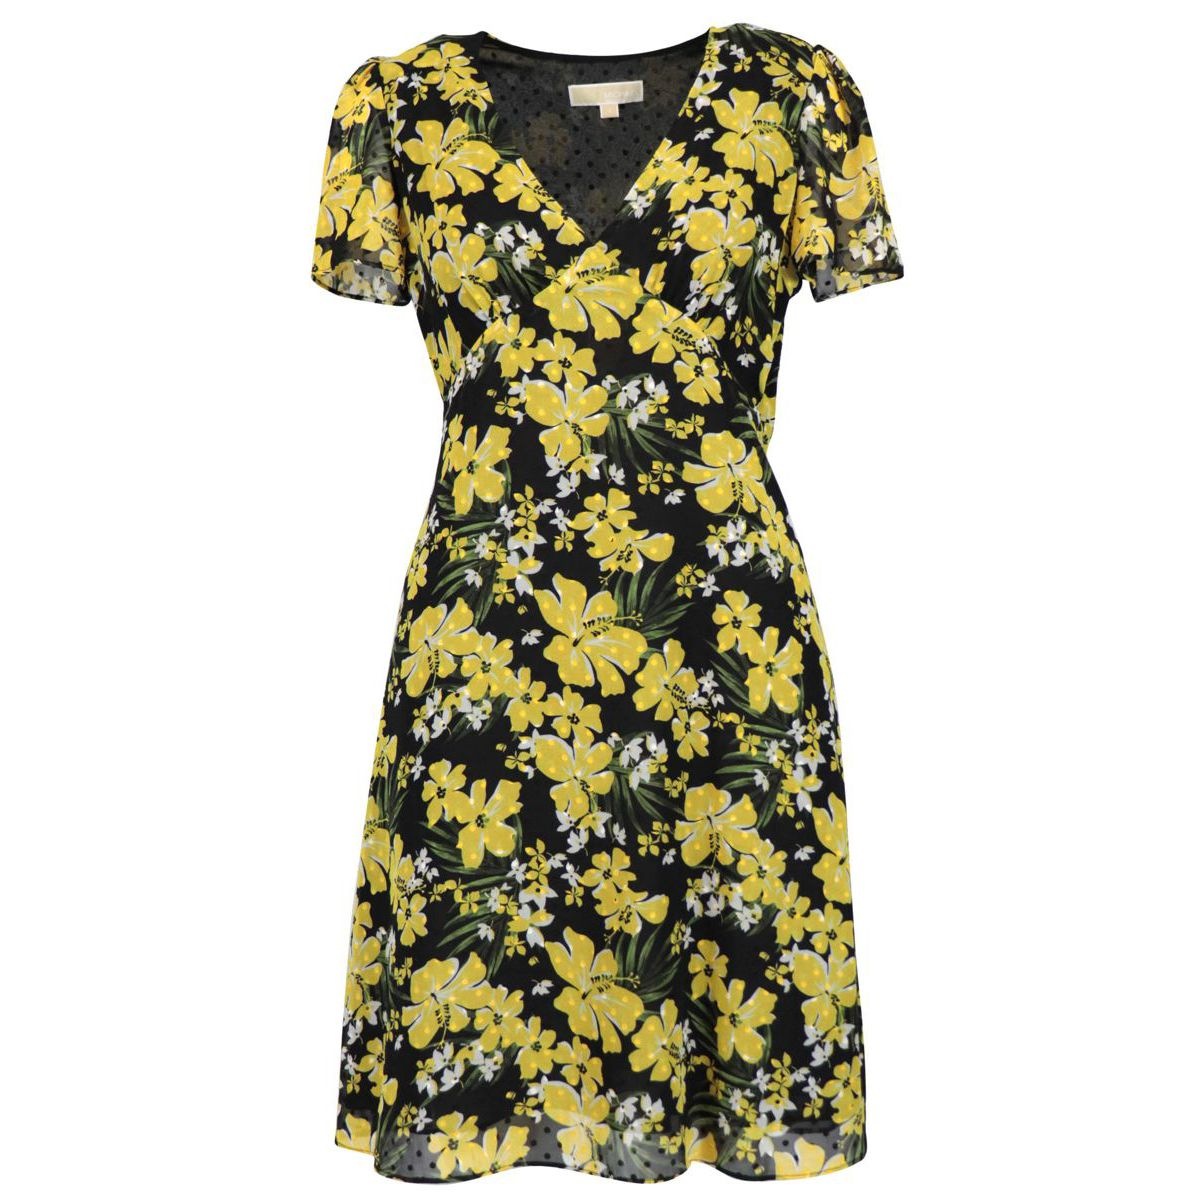 Short-sleeved viscose dress with flower print Yellow black Michael Kors